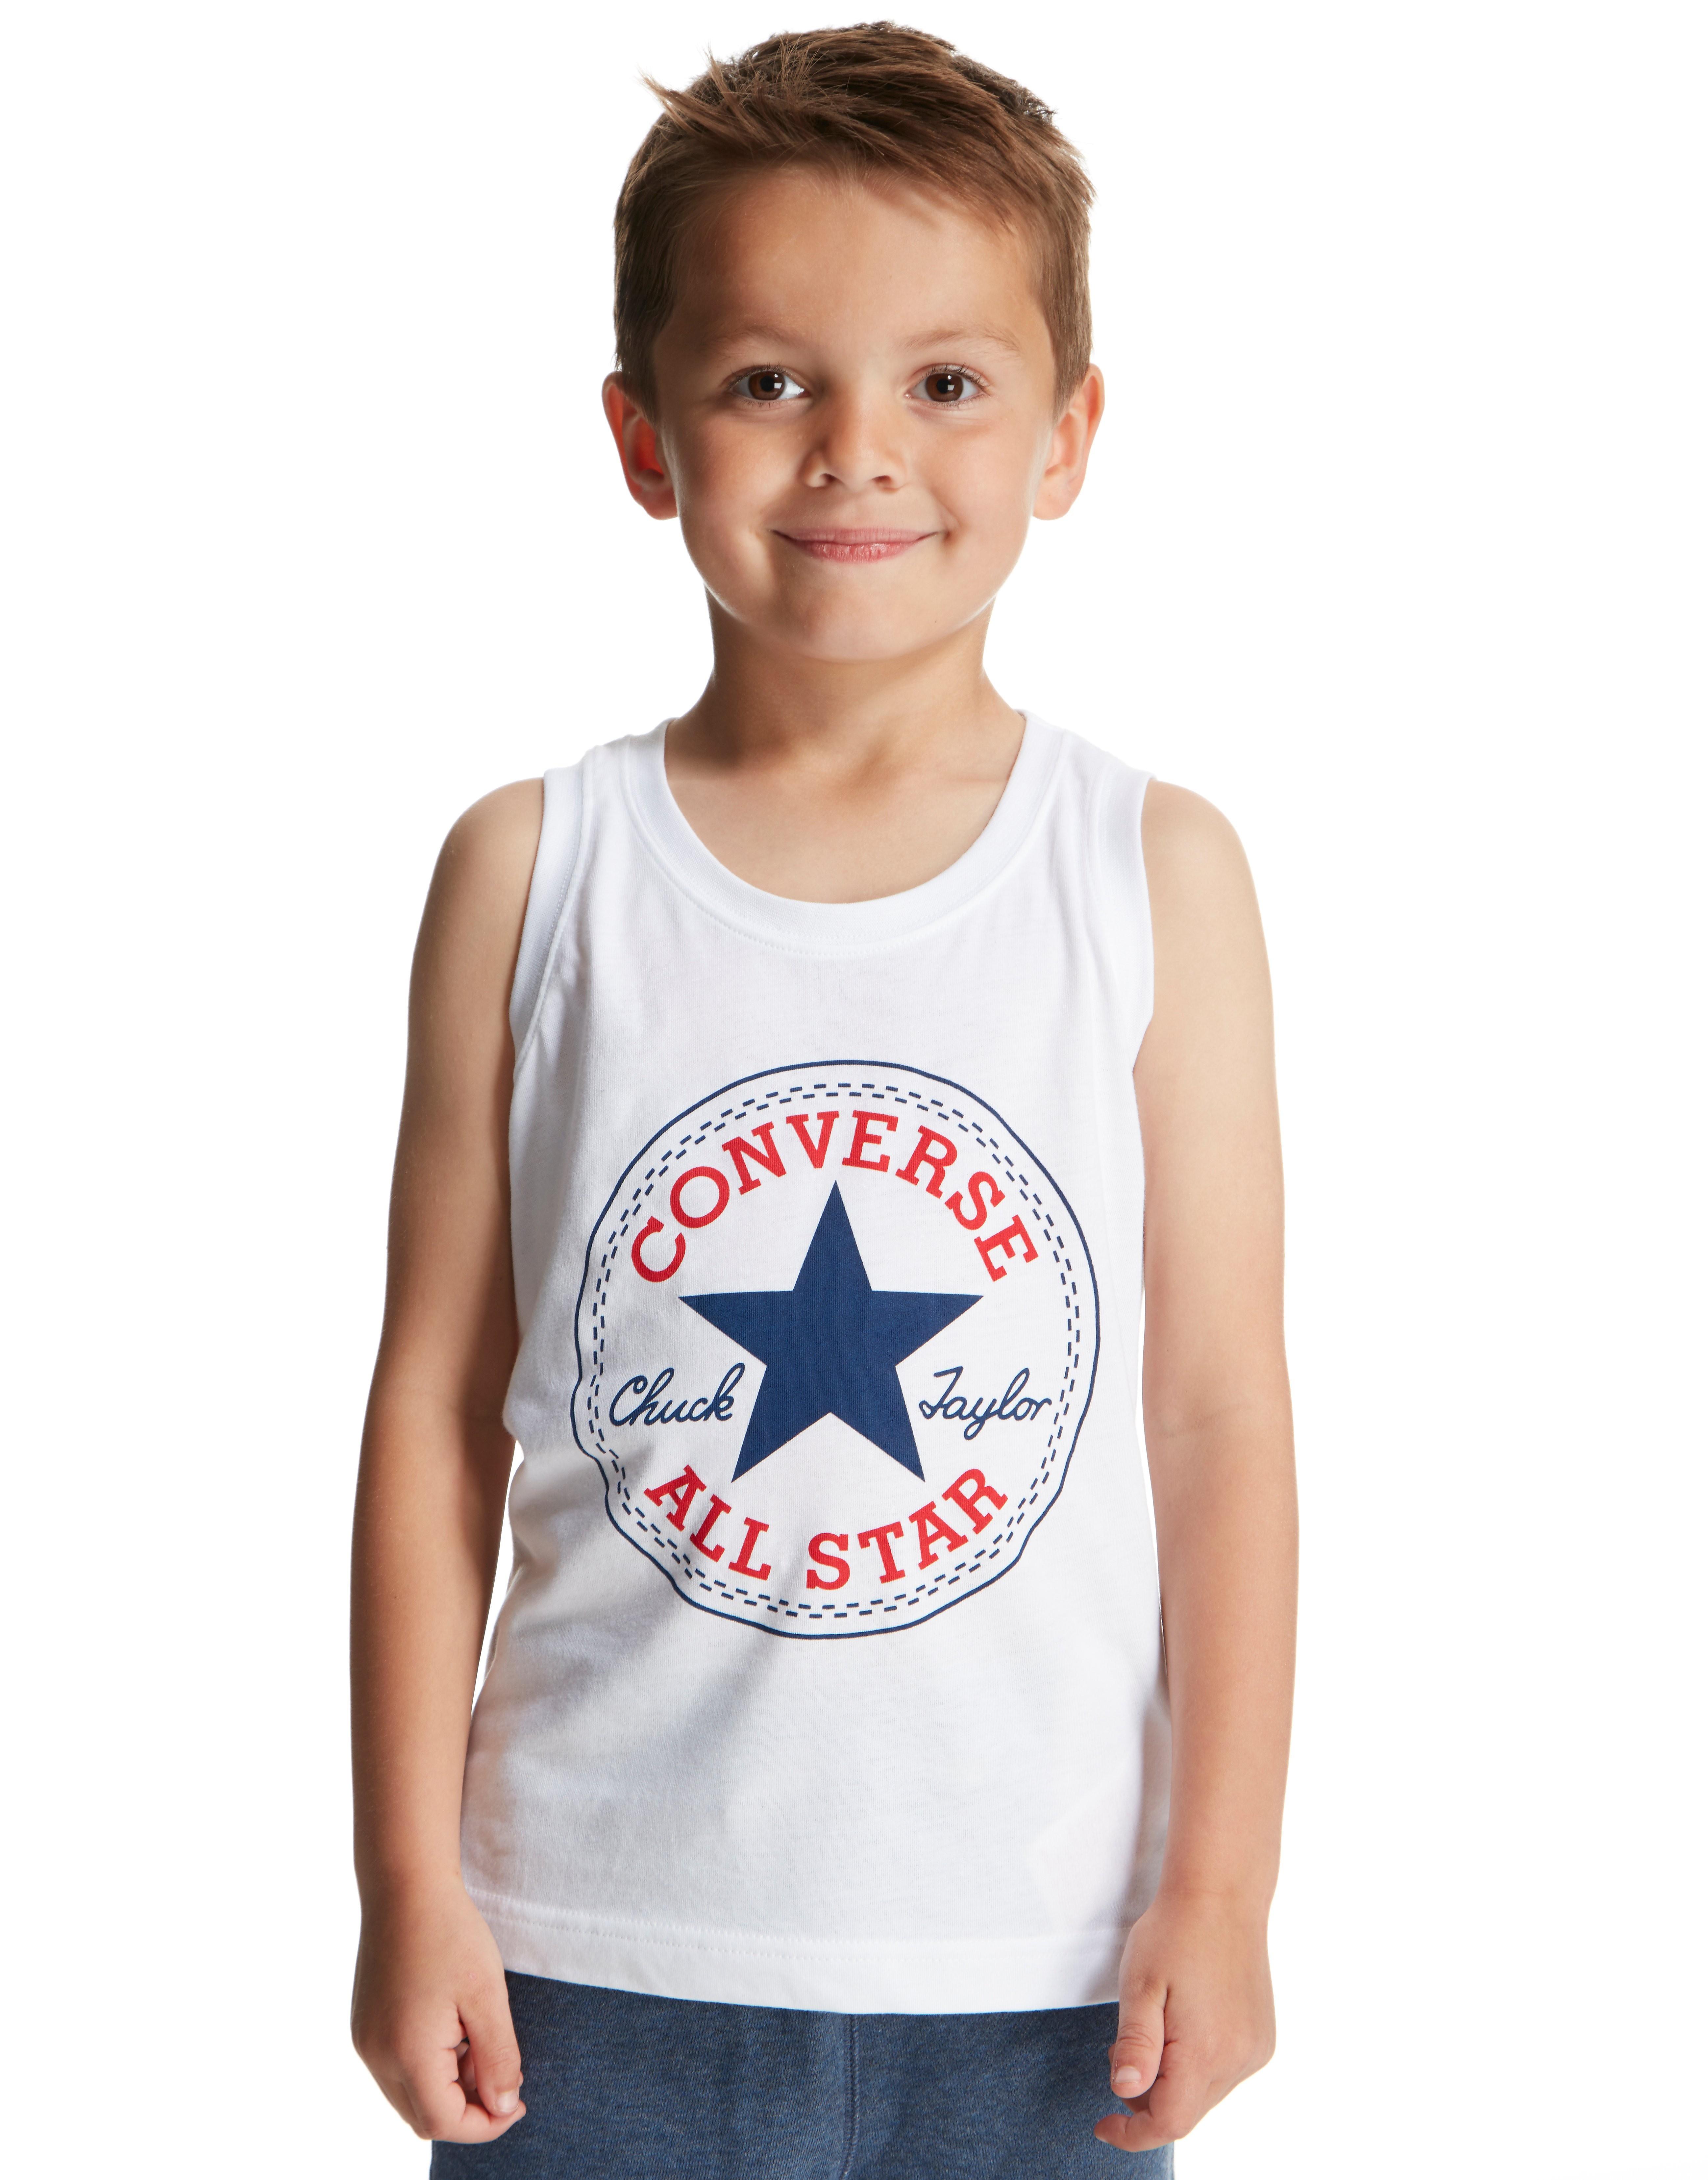 Converse Chuck Vest Children